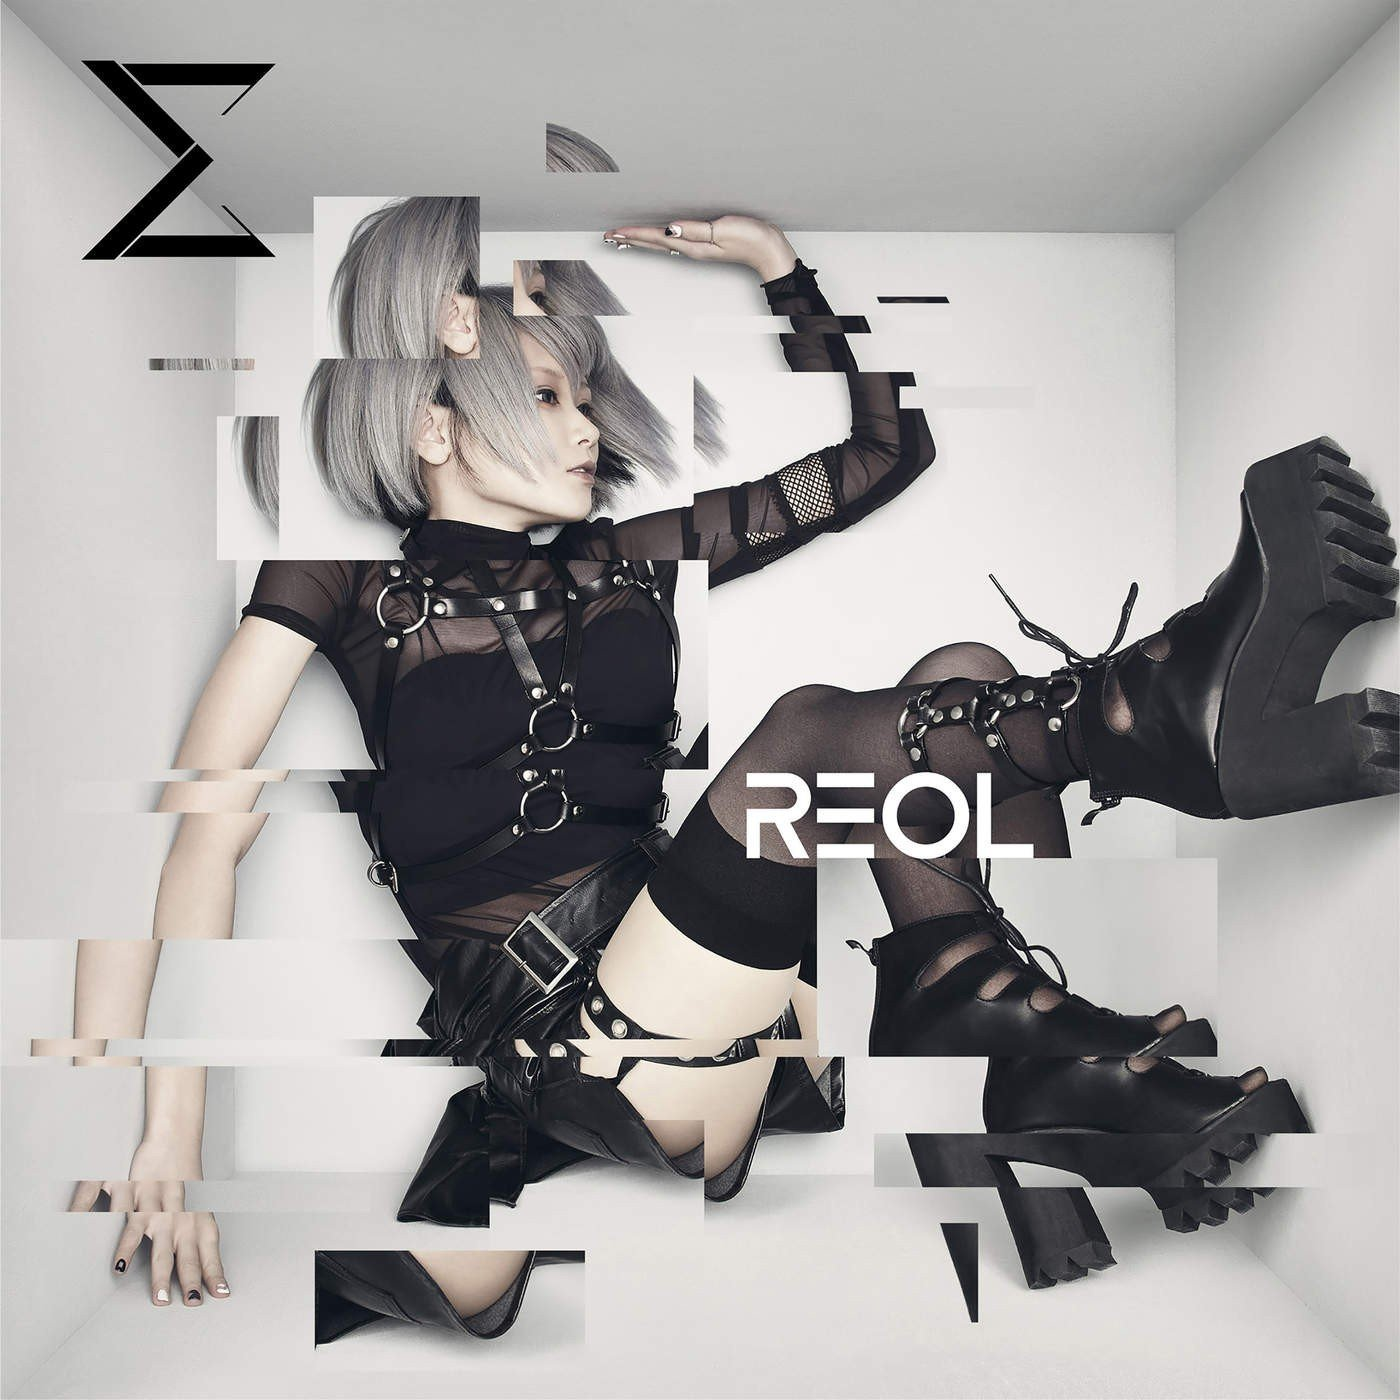 REOL – Σ (Sigma) [FLAC / 24bit Lossless / WEB] [2016.10.19]